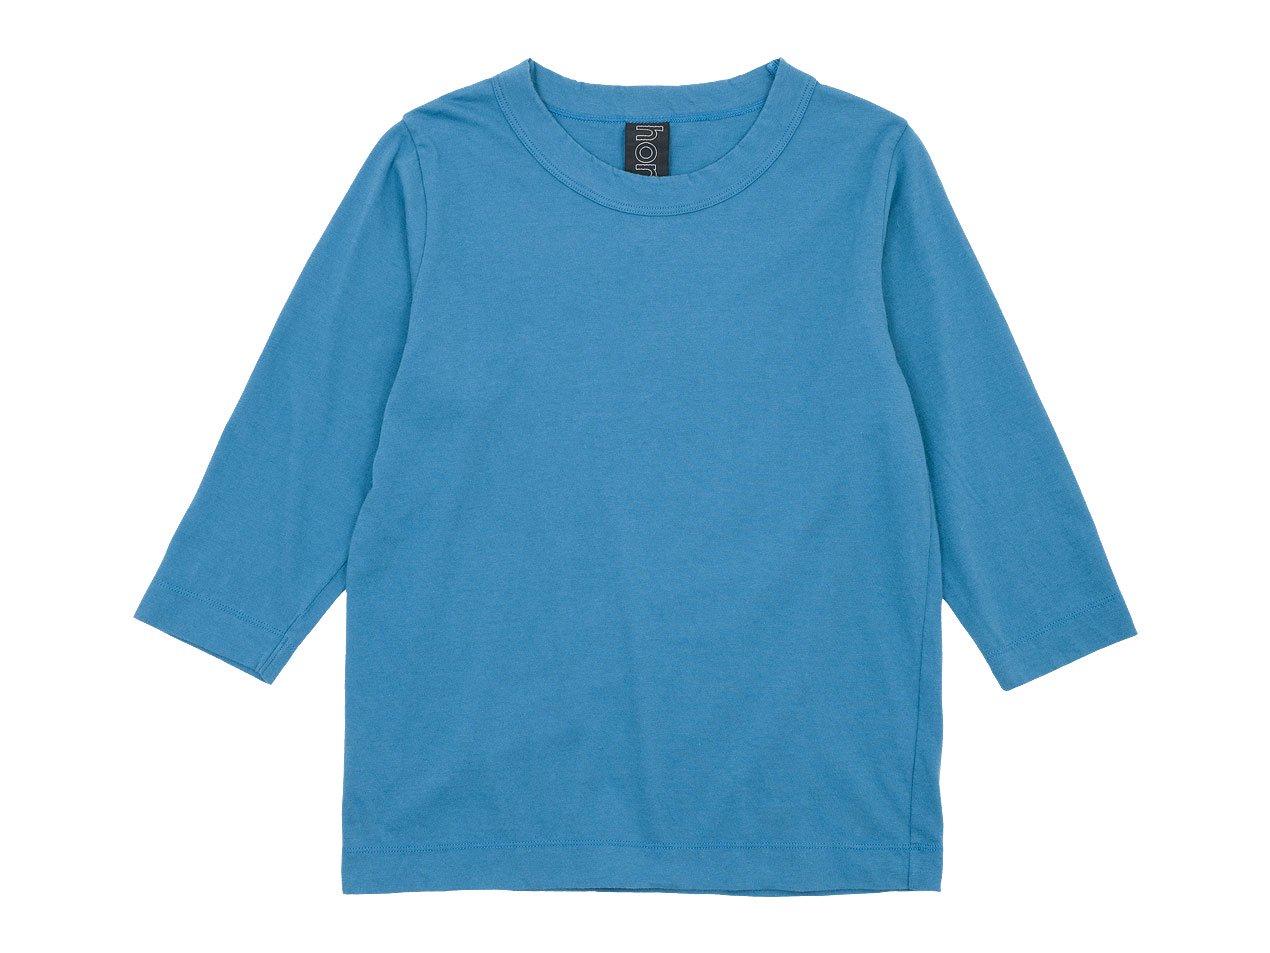 homspun 30/1天竺 七分袖Tシャツ サックス